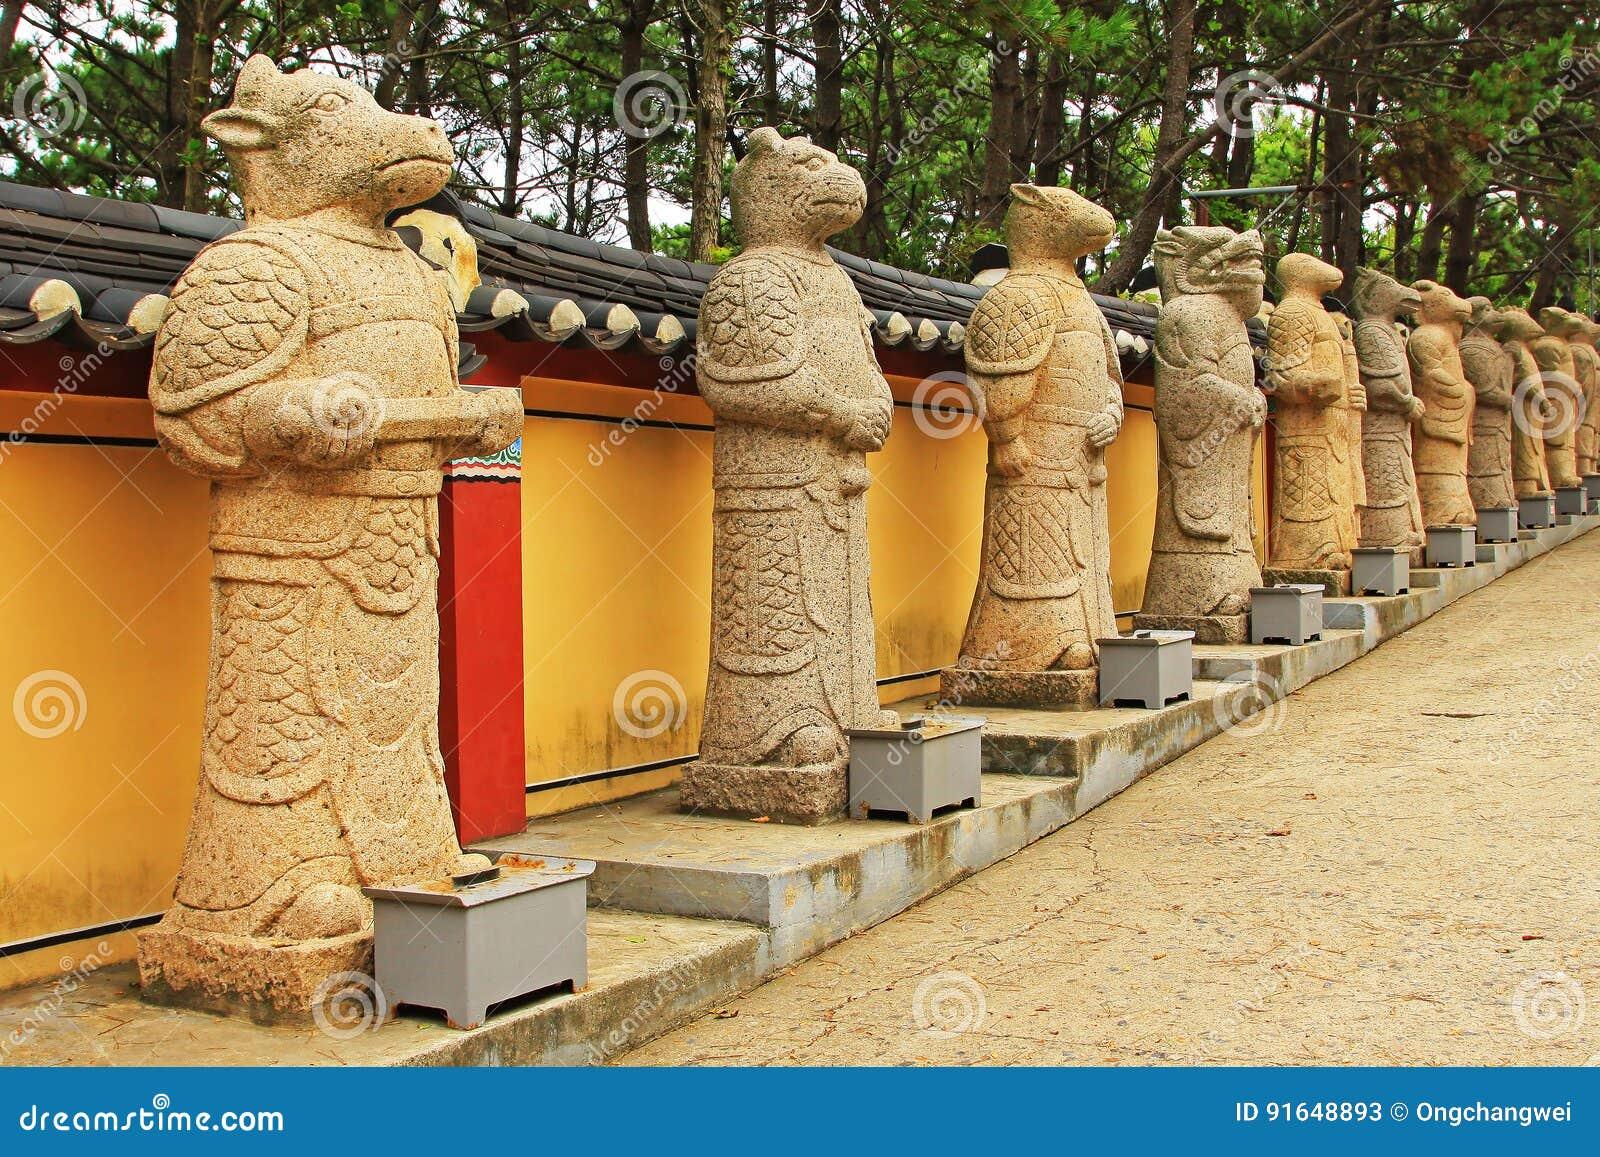 Korea Busan Haedong Yonggungsa Temple